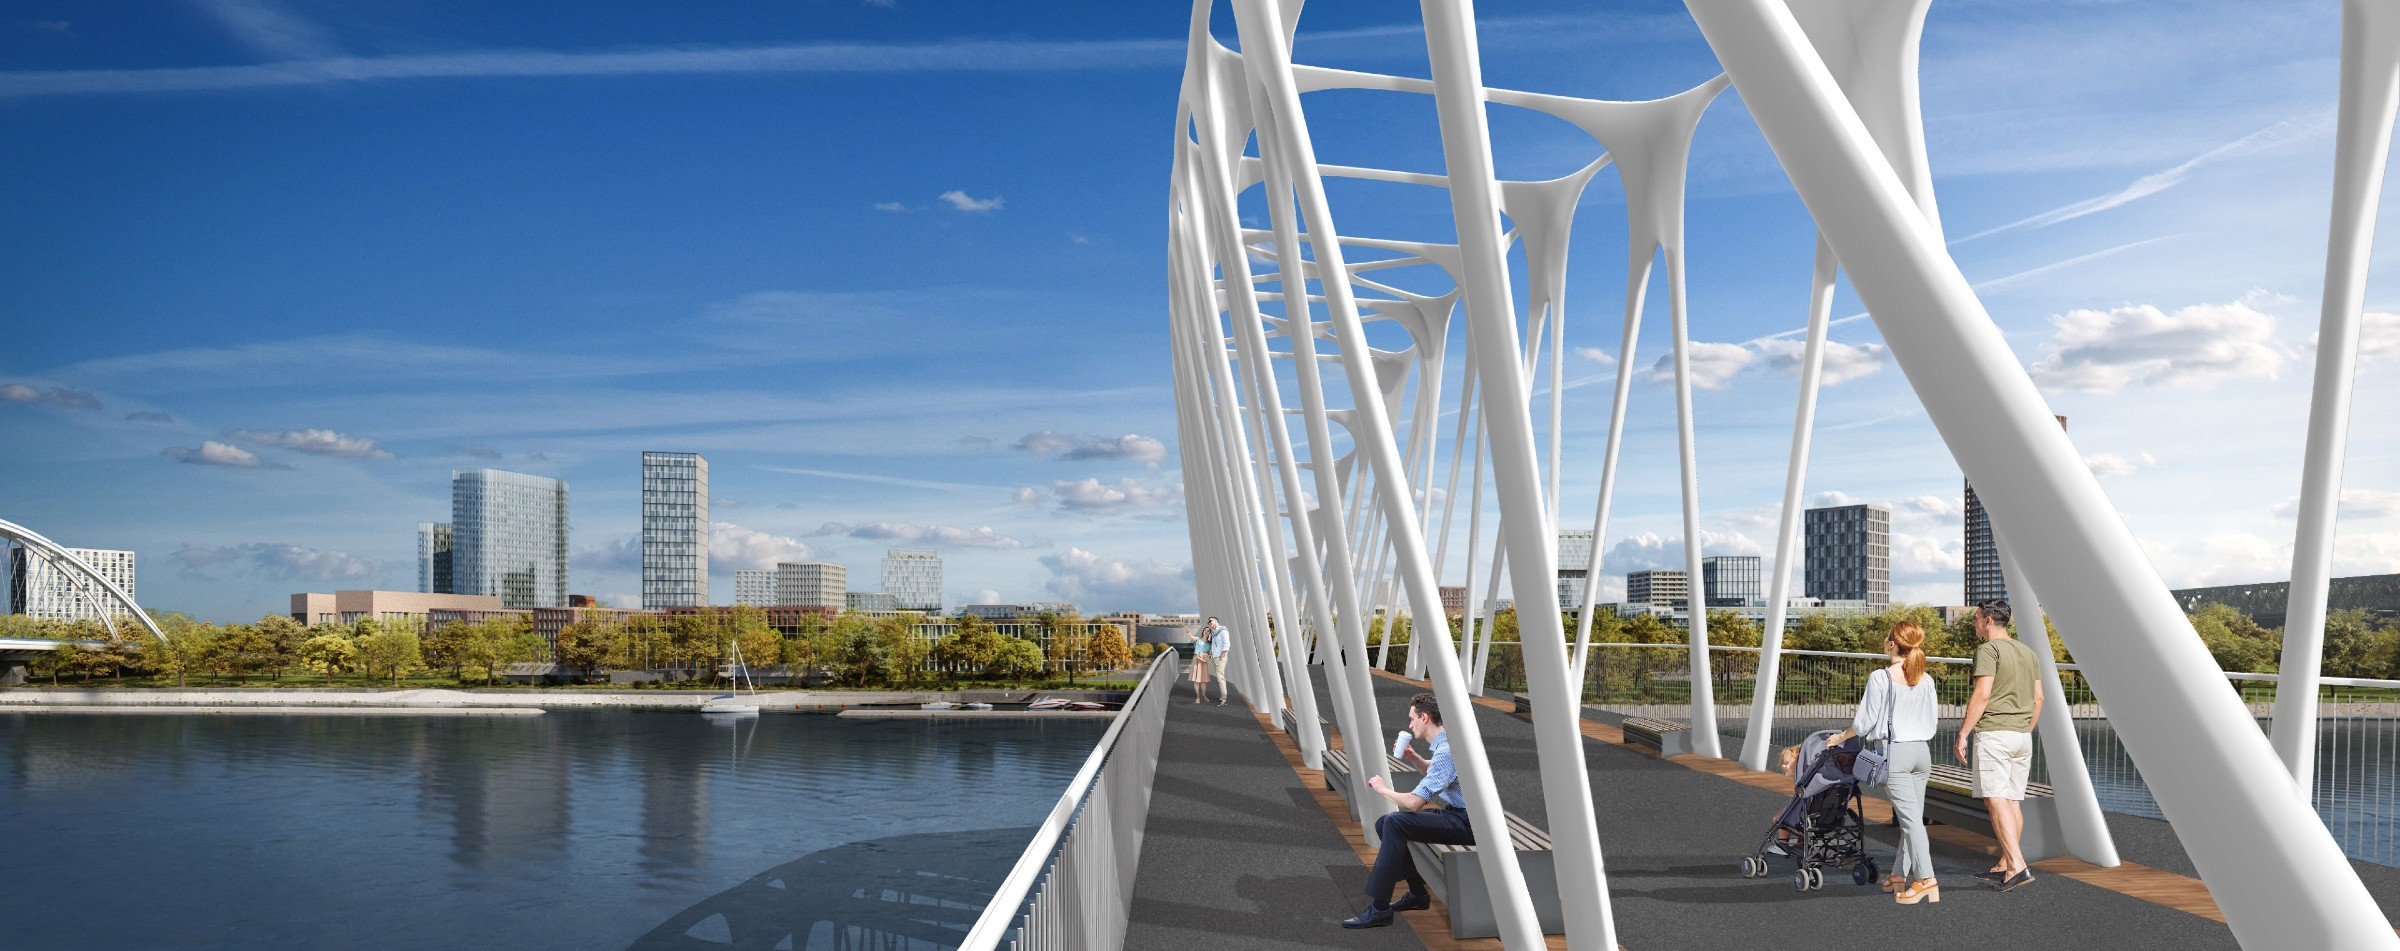 promenadny most